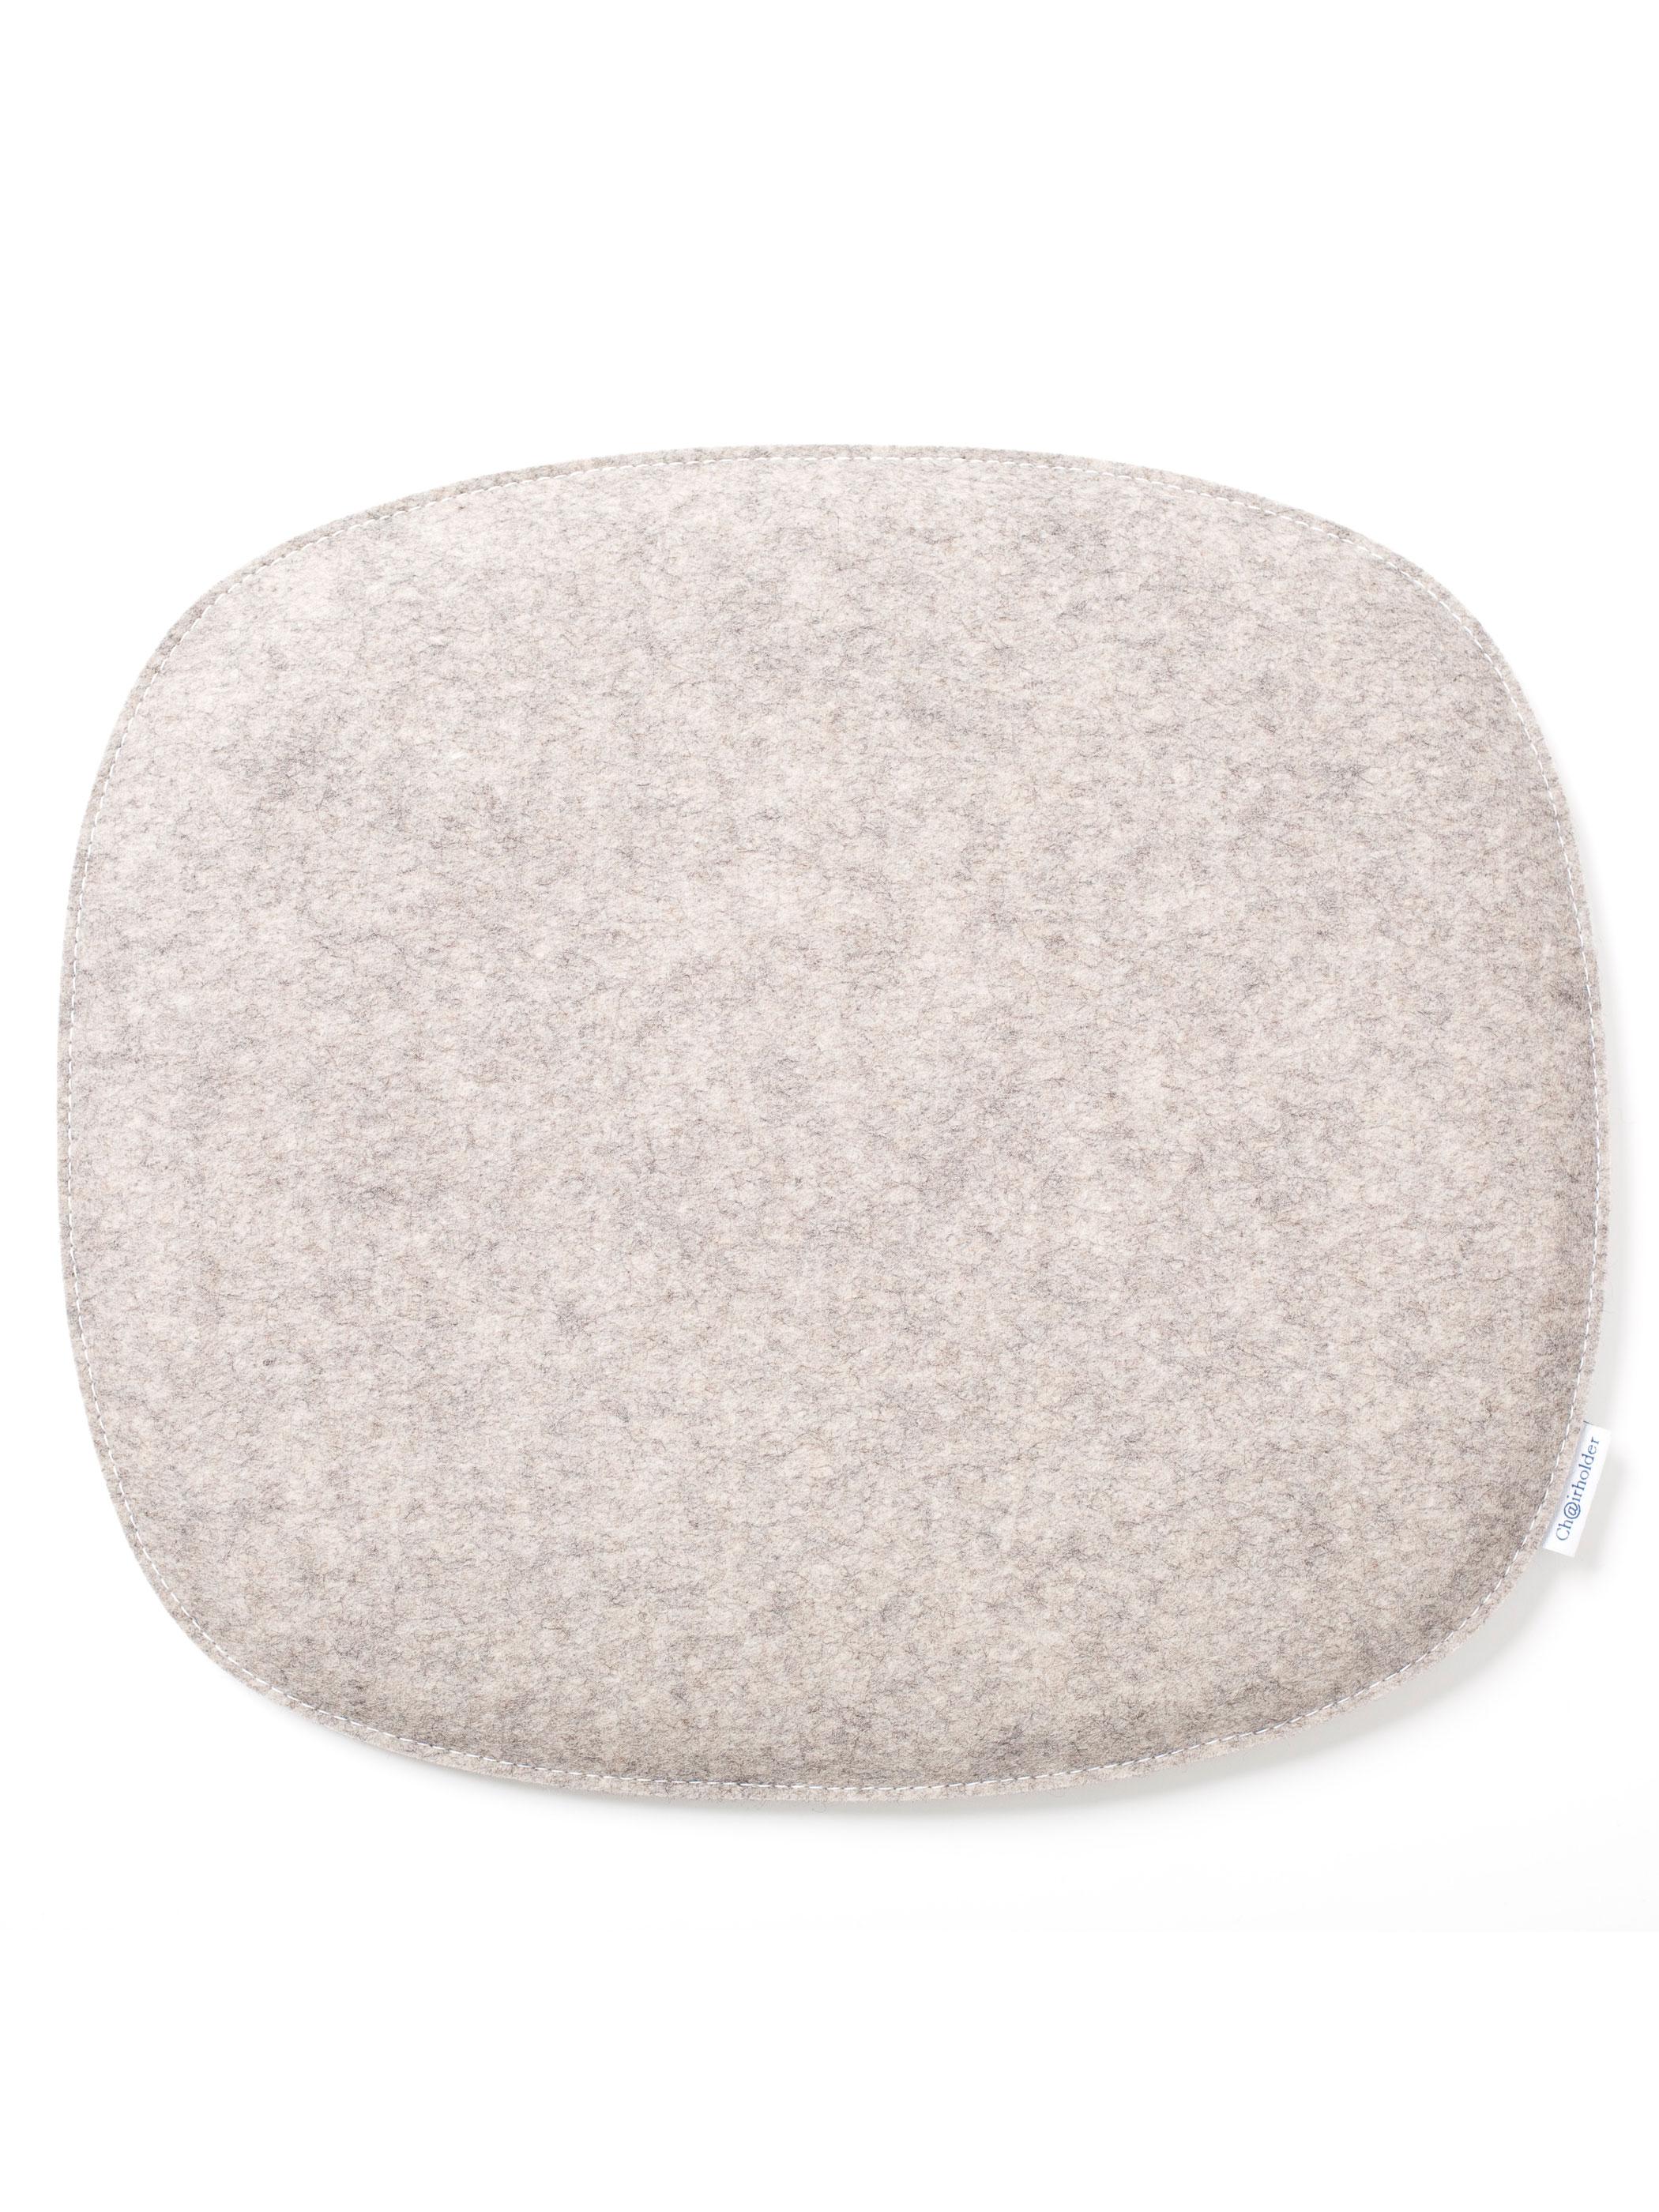 Gartenmobel Edelstahl Outlet :  sofa Kettler gartenmöbel hochwertig und funktional höffner